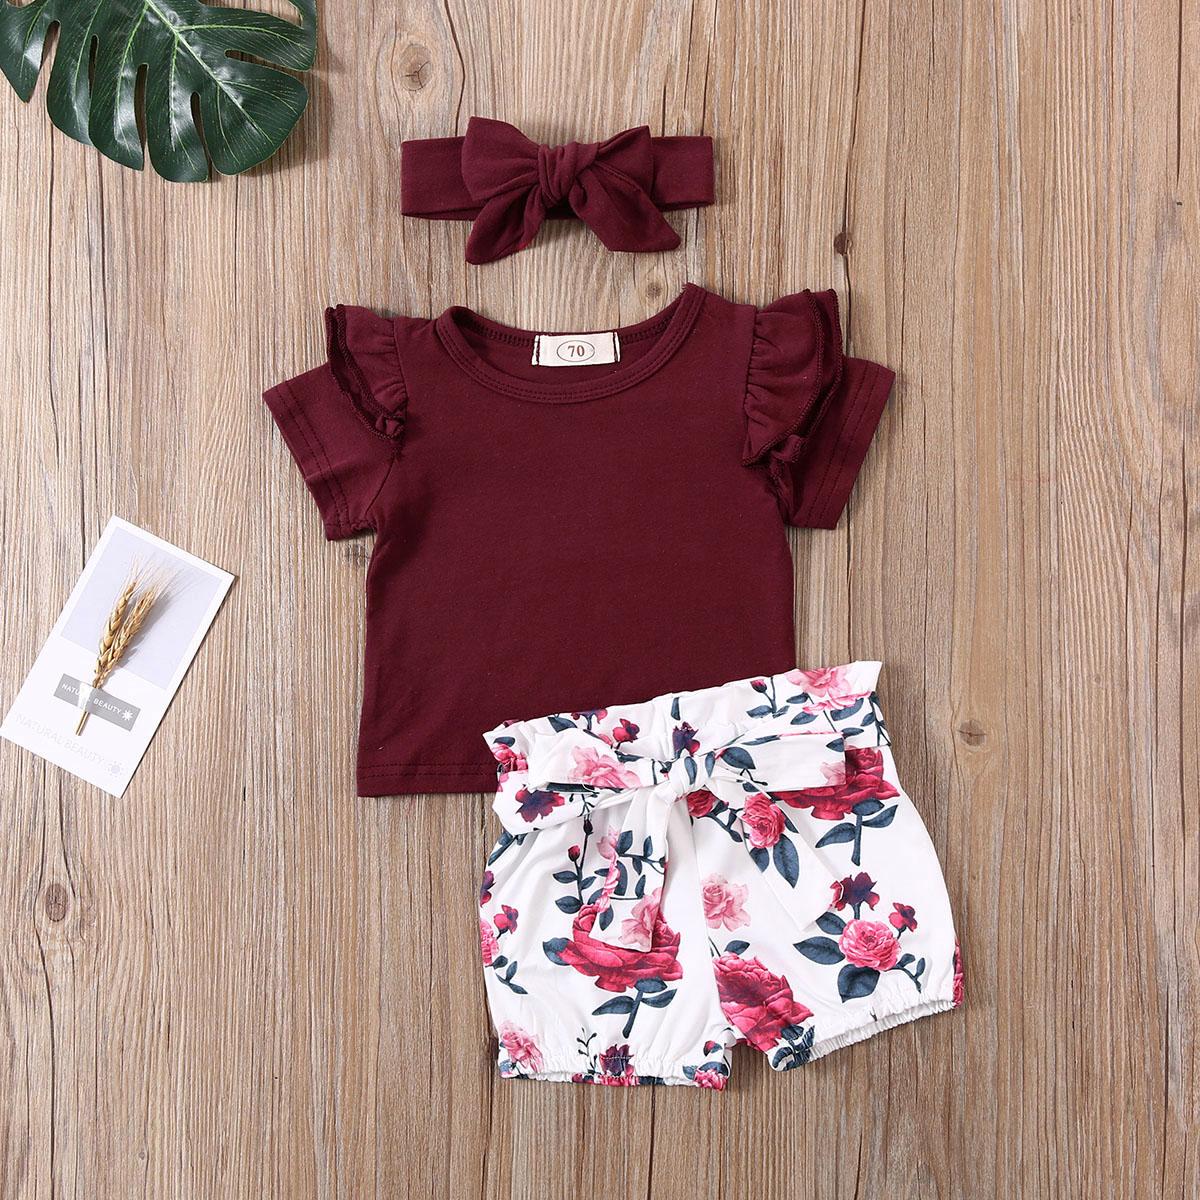 Toddler Baby Girl Short Pants Floral Ruffle Sleeve Dress Romper Shorts Headband 3PCS Summer Clothes Outfits